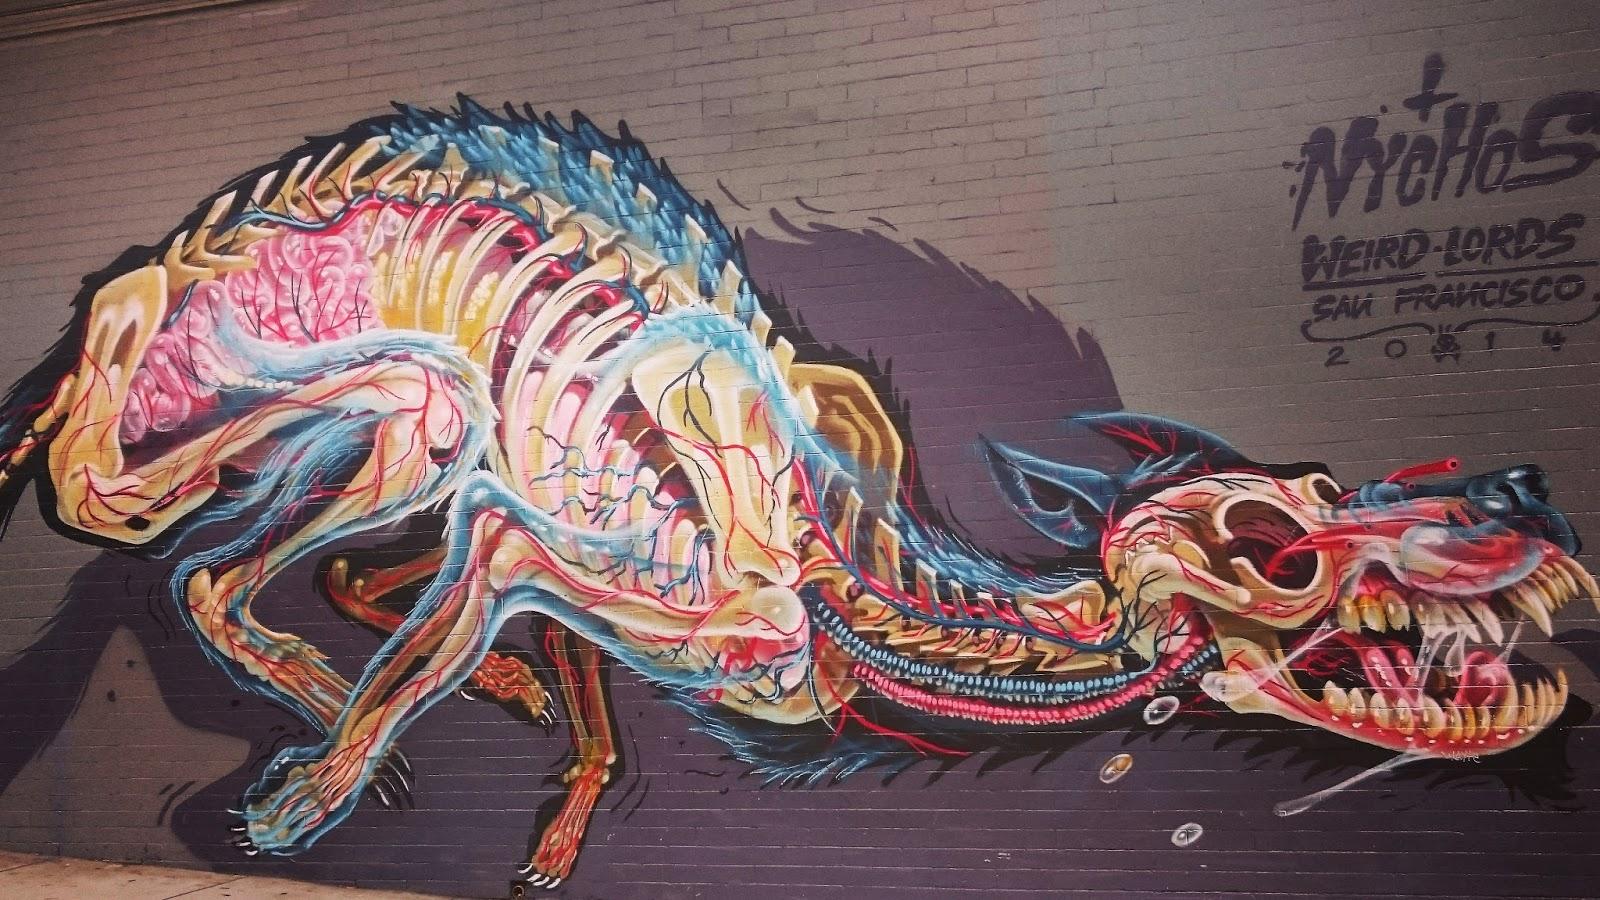 Colourful Dog skeleton graffiti art Haight Ashbury San Francisco